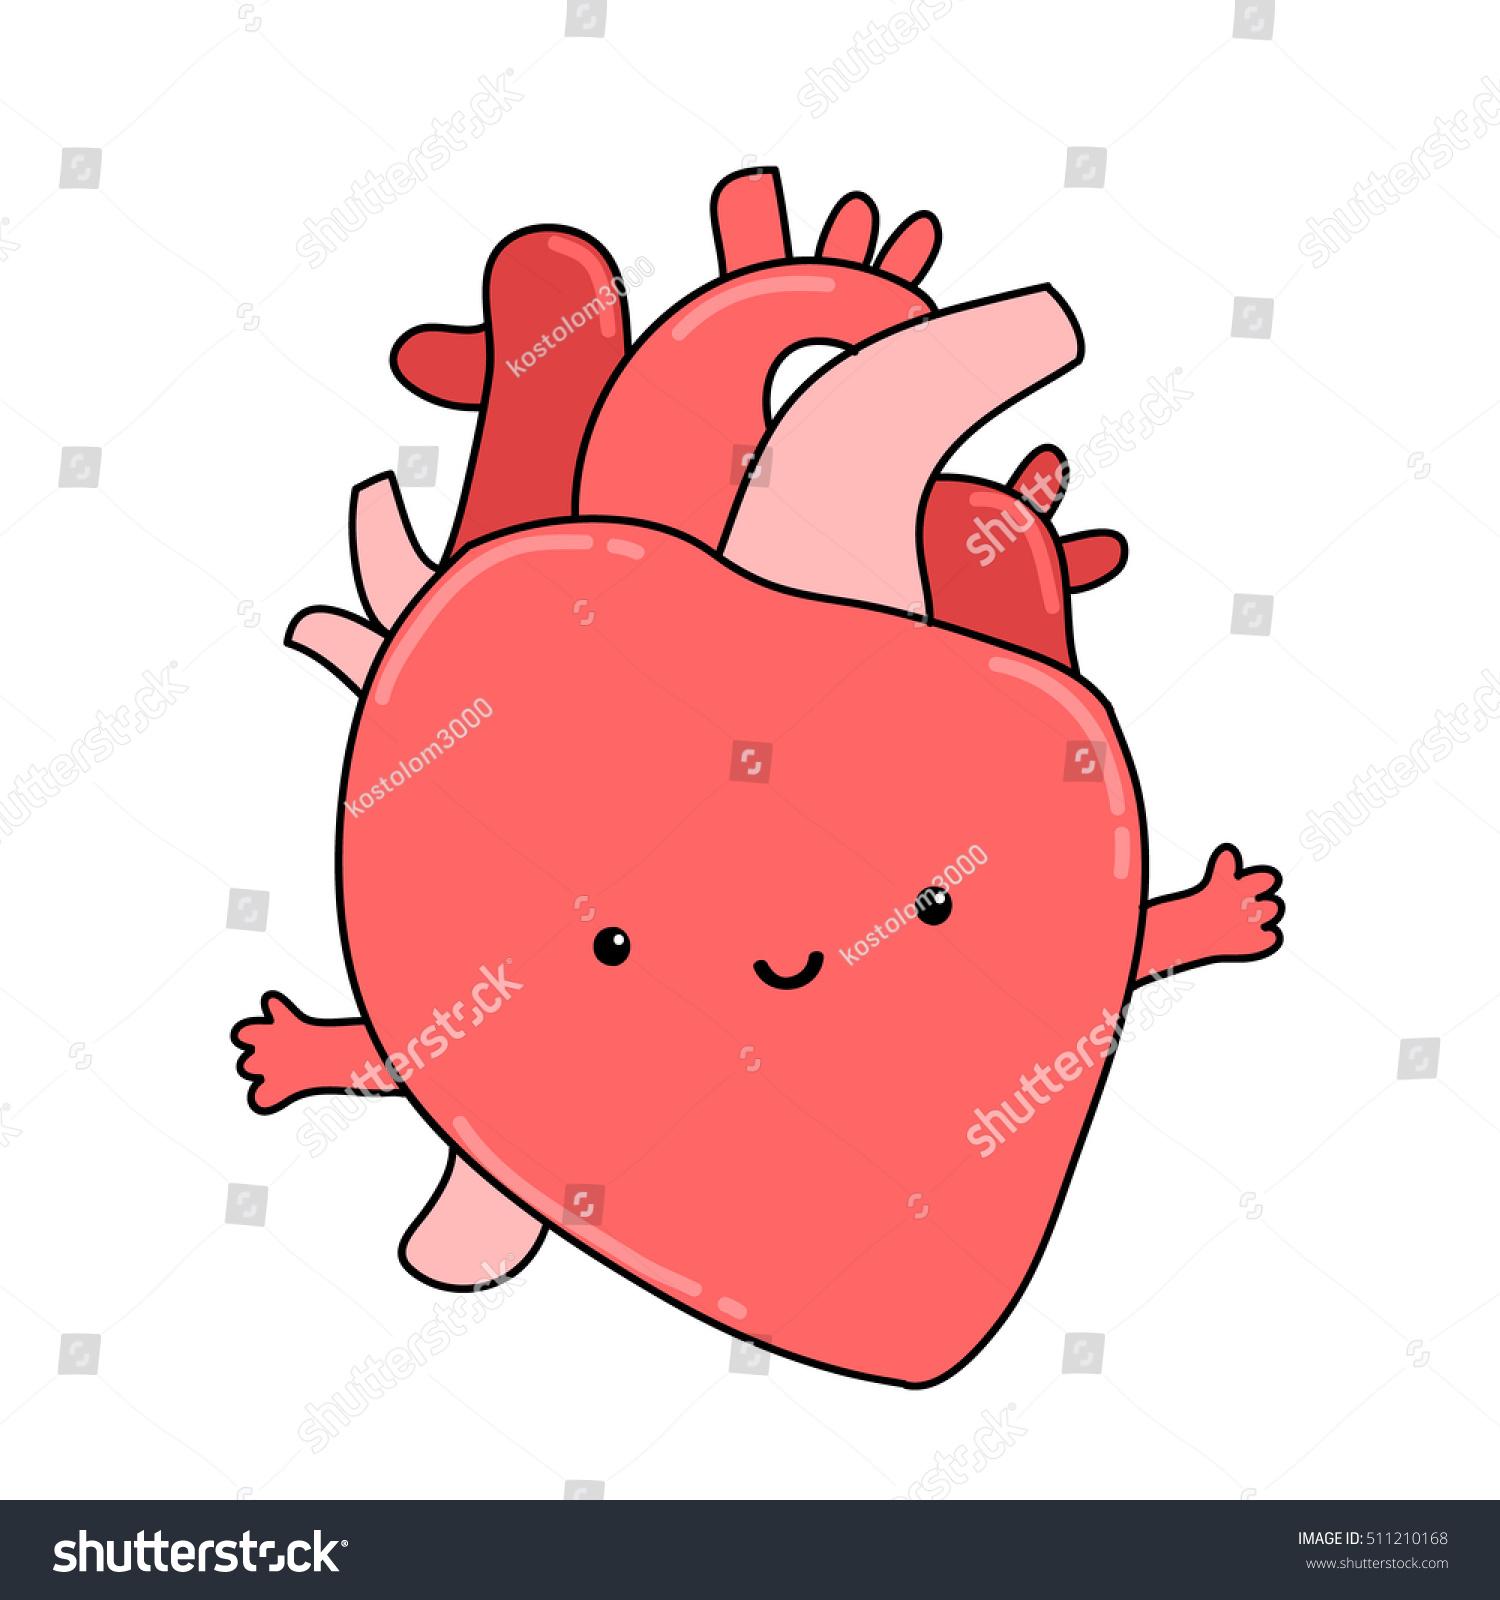 Cute Anatomical Cartoon Human Heart Organ Stock Vector